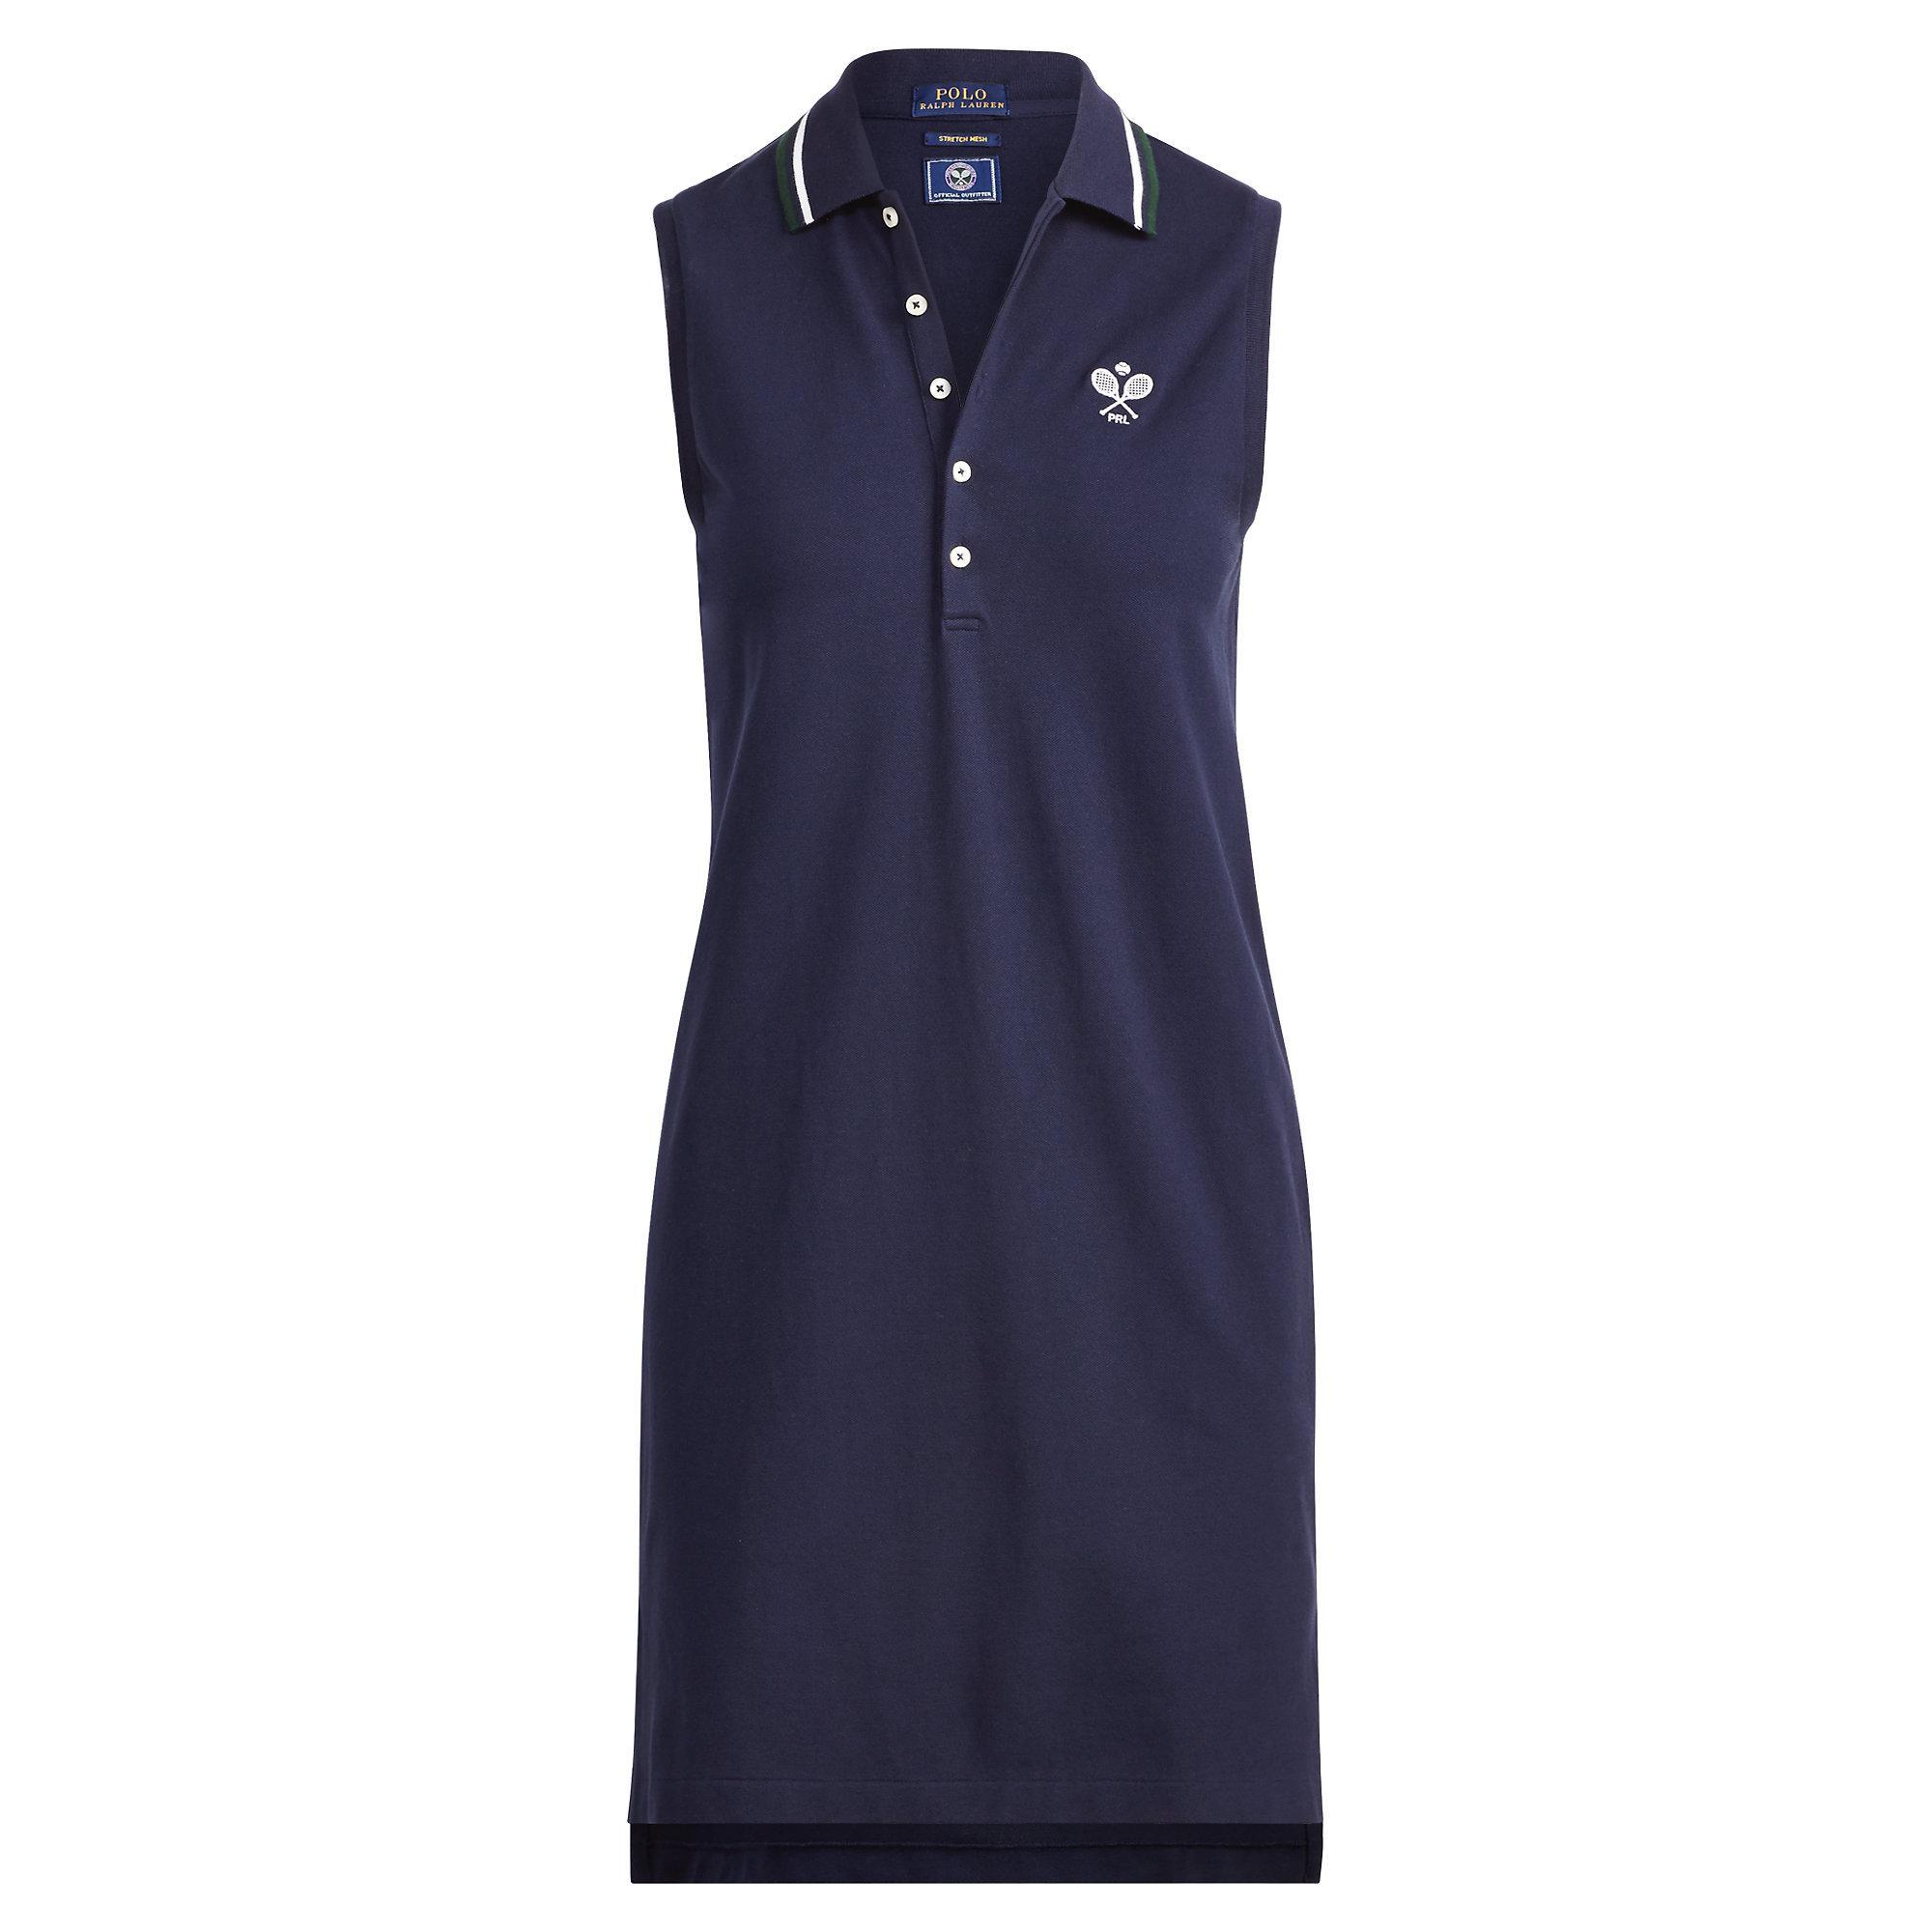 800c2e5b952f2 Lyst - Polo Ralph Lauren Wimbledon Mesh Polo Dress in Blue